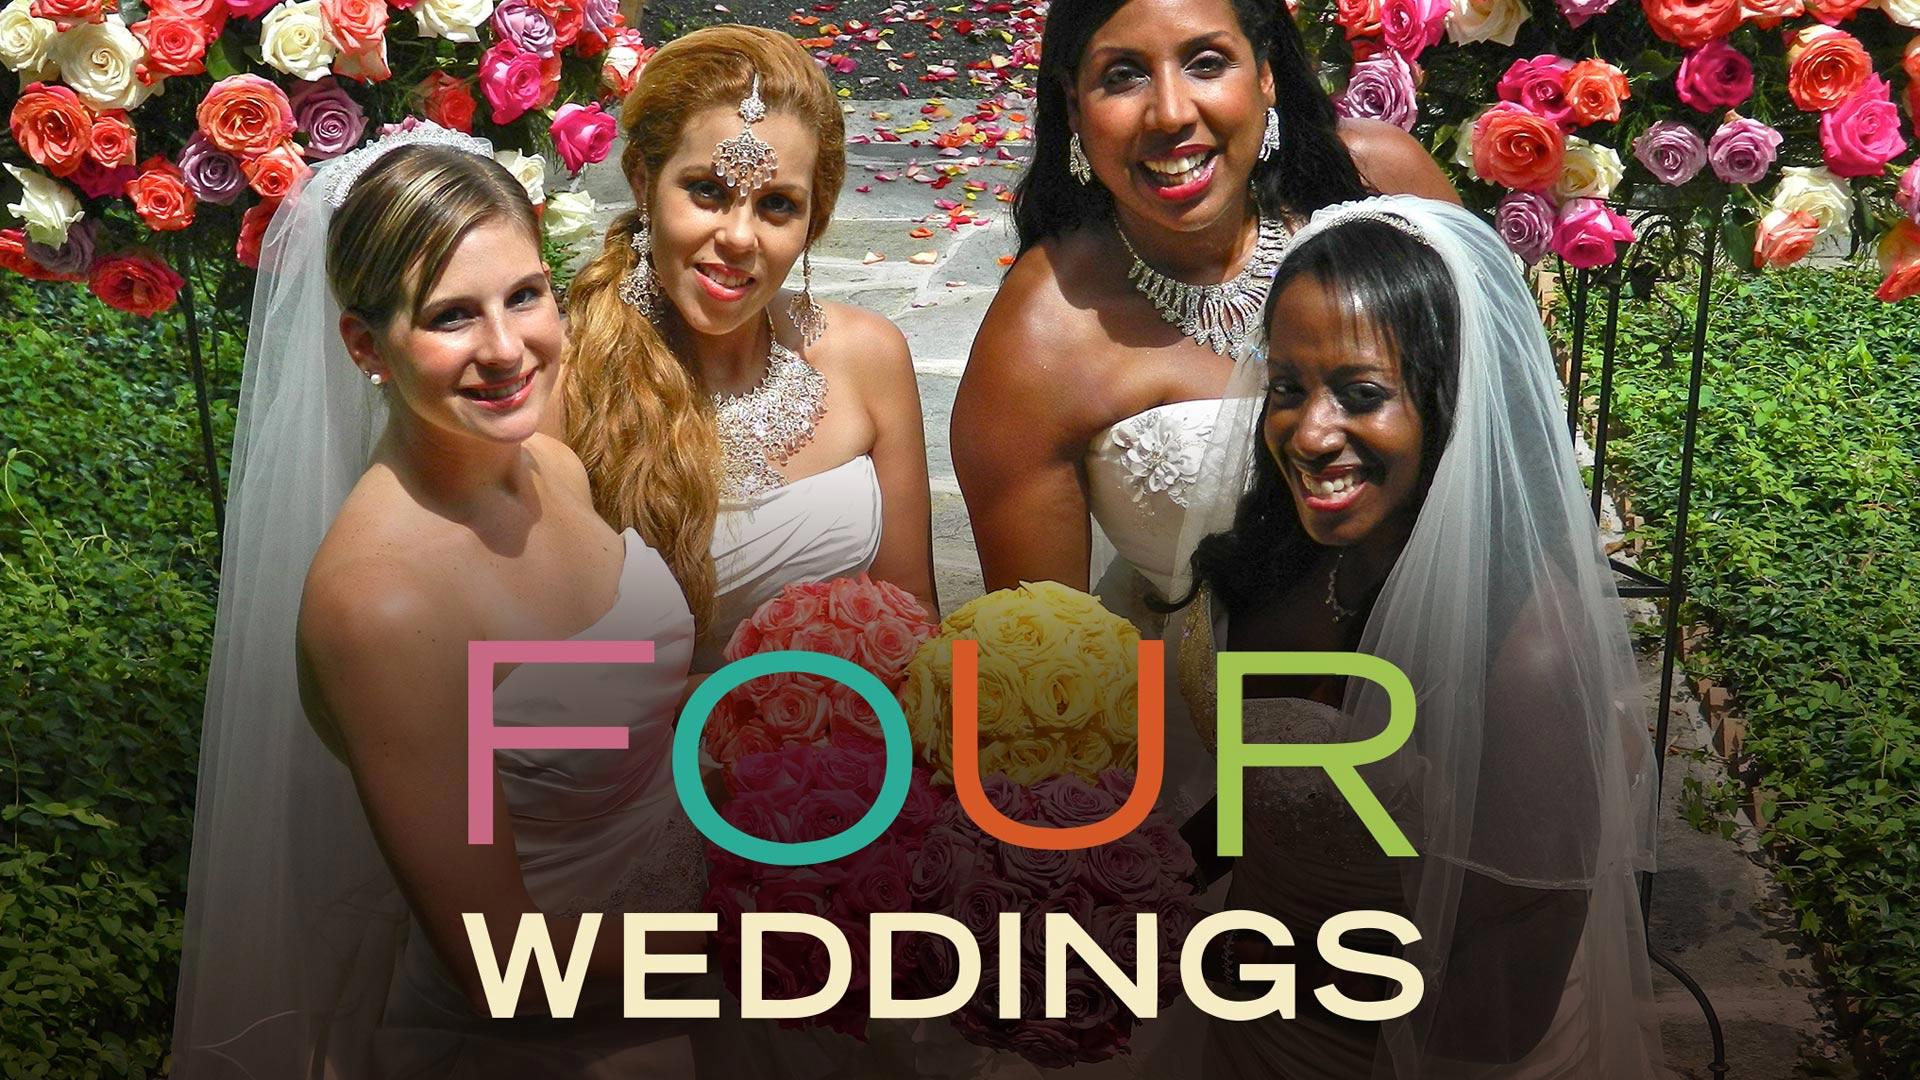 Four Weddings - Season 1